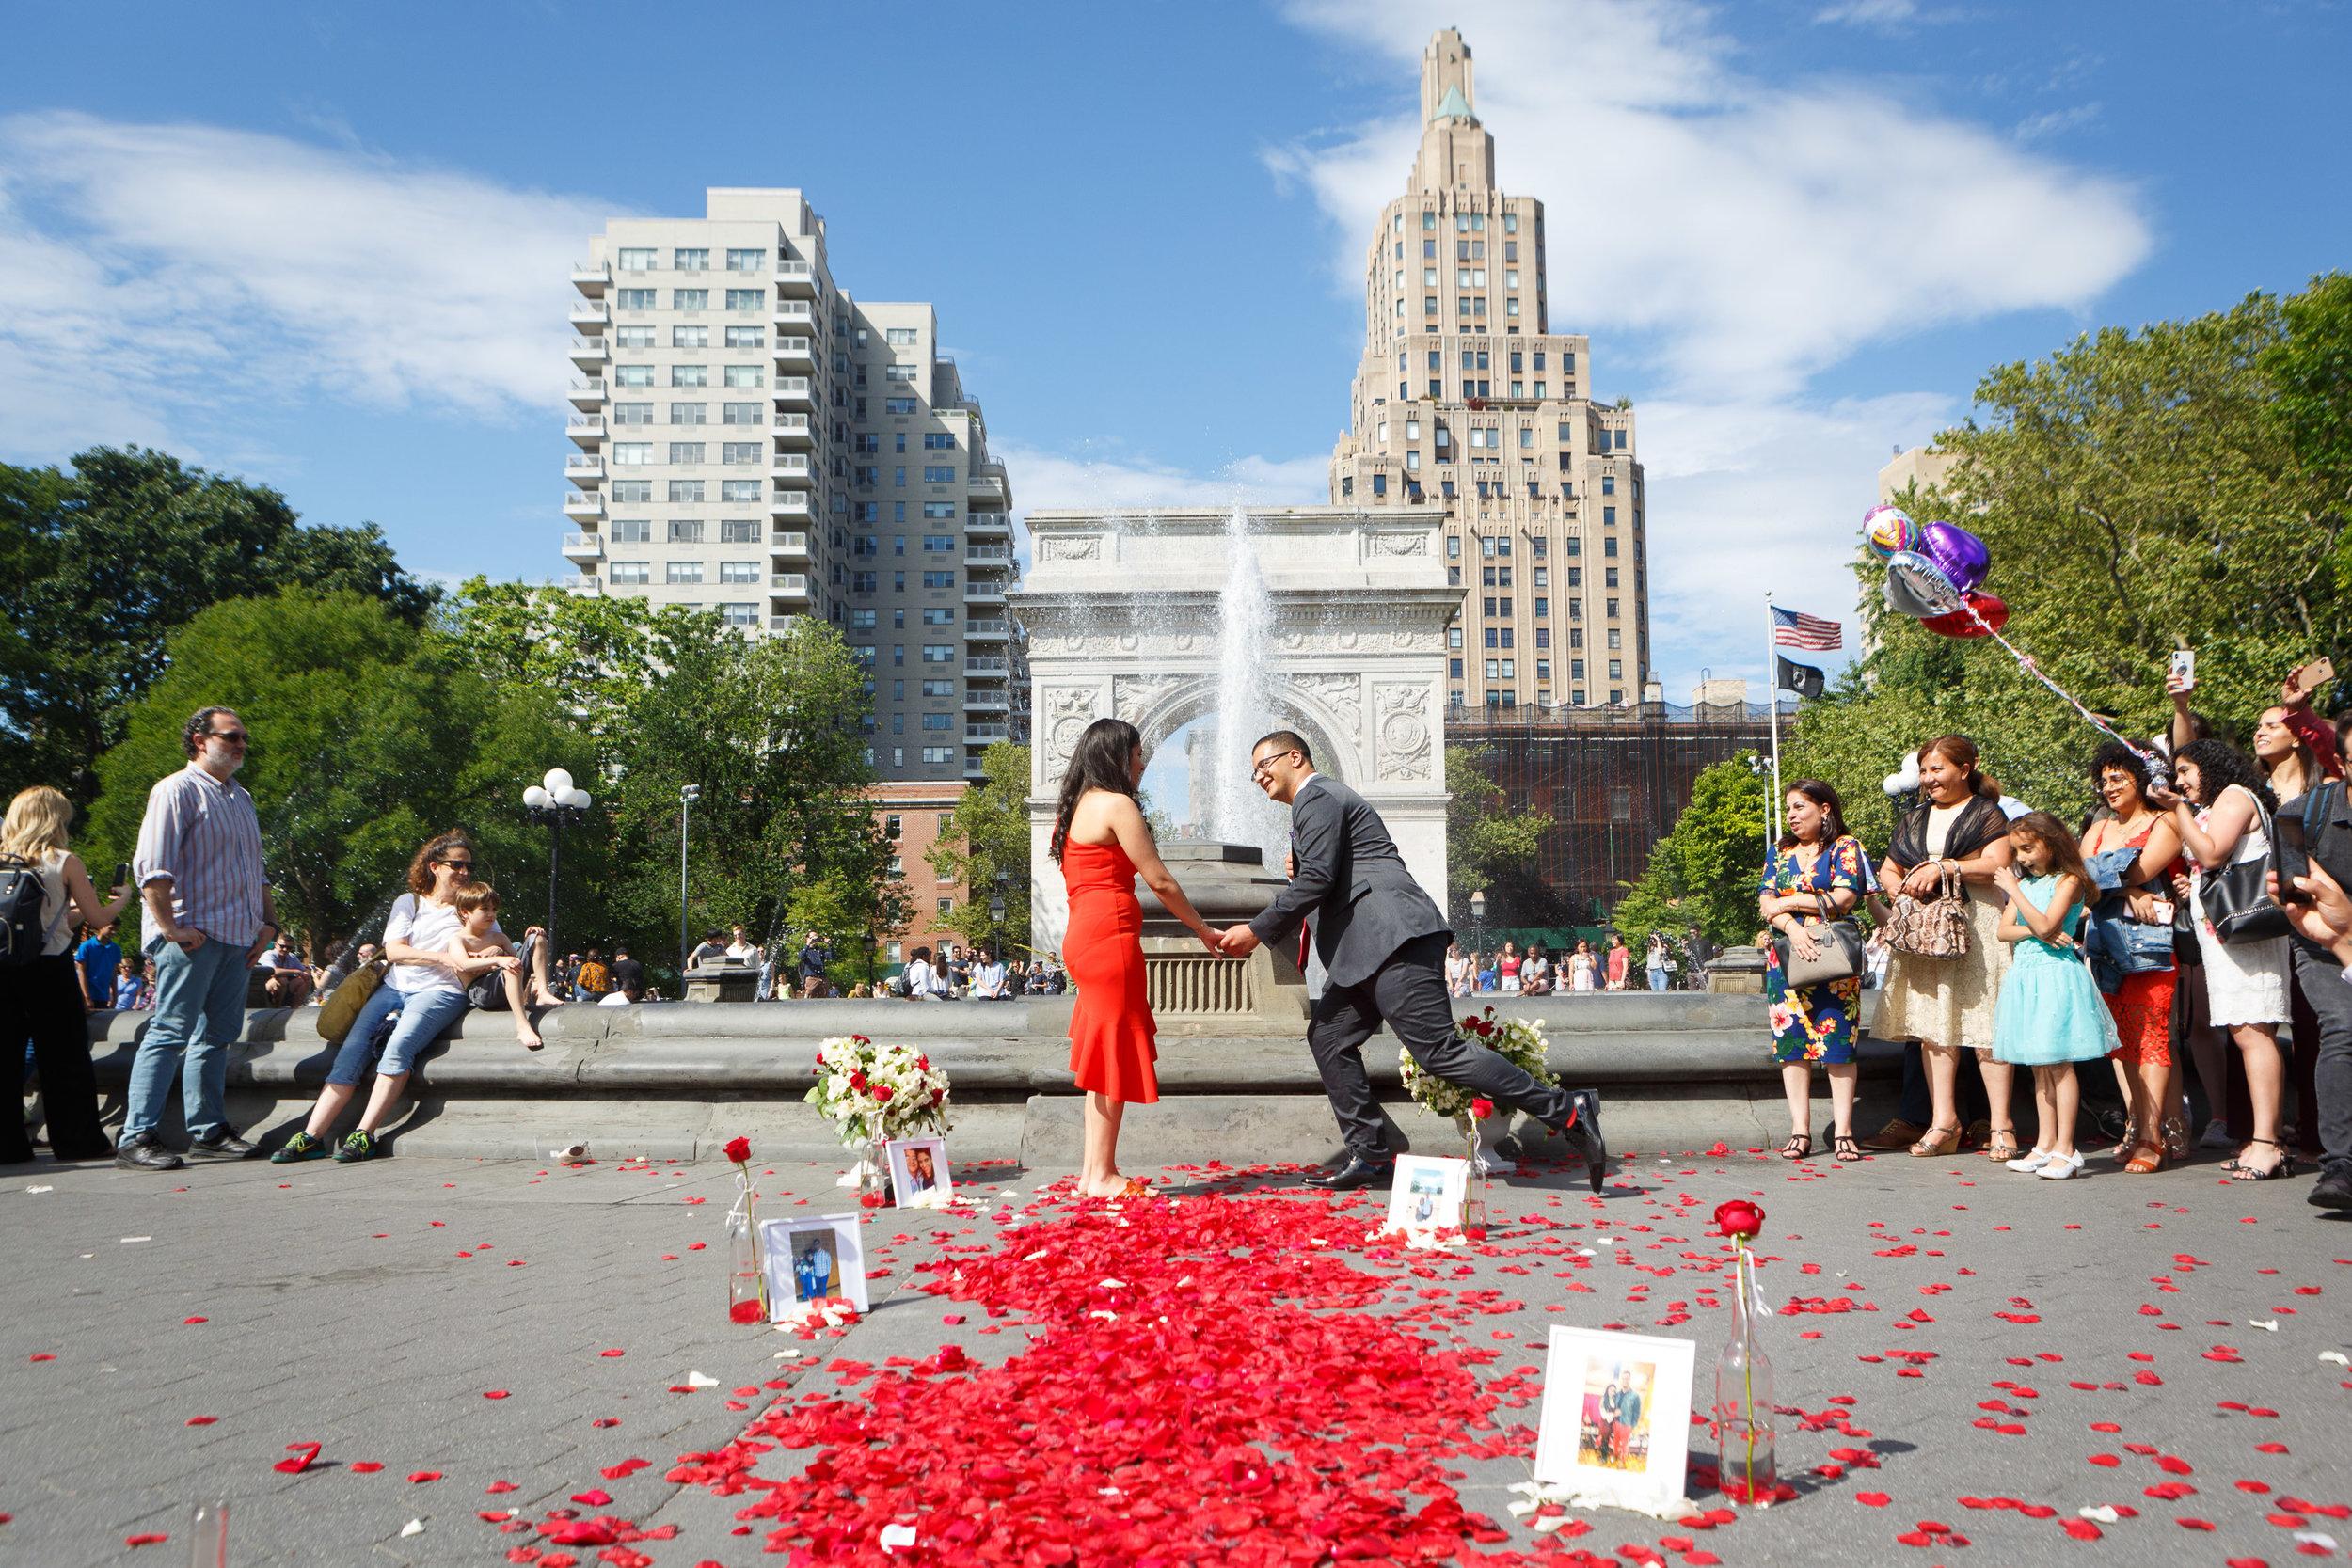 Kiro Rebecca Washington Square Park Marriage Proposal _ Jonathan Heisler _ 6152019 _020.jpg